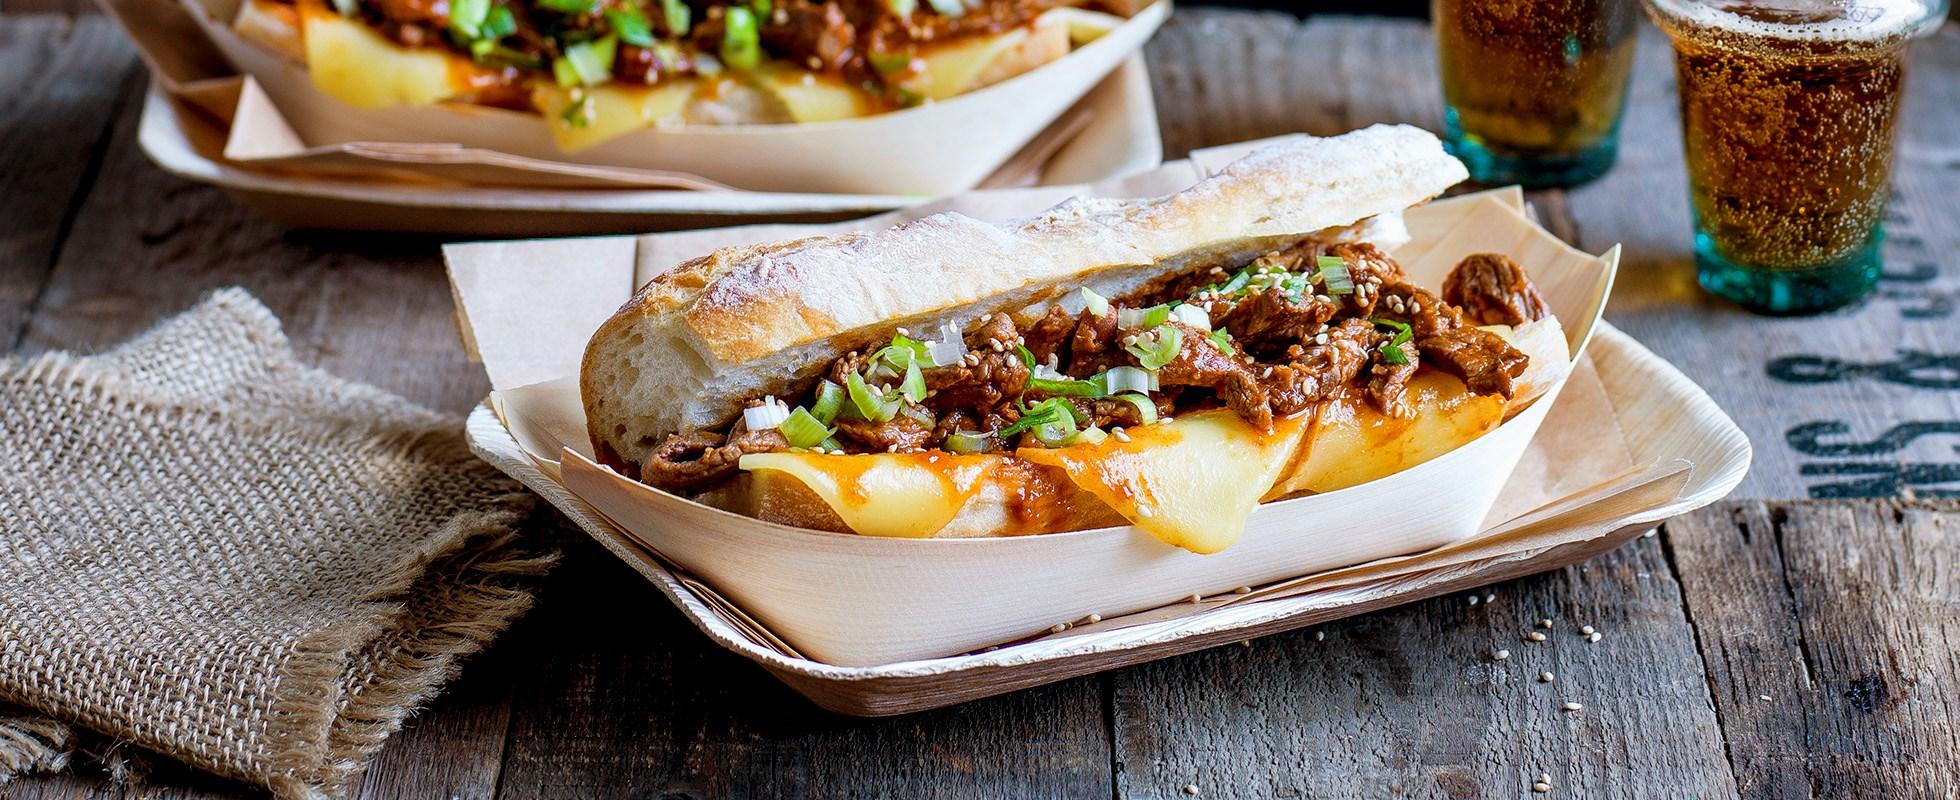 Best ever asian street food recipes olive magazine olive magazine bulgogi cheese steak sandwich forumfinder Images